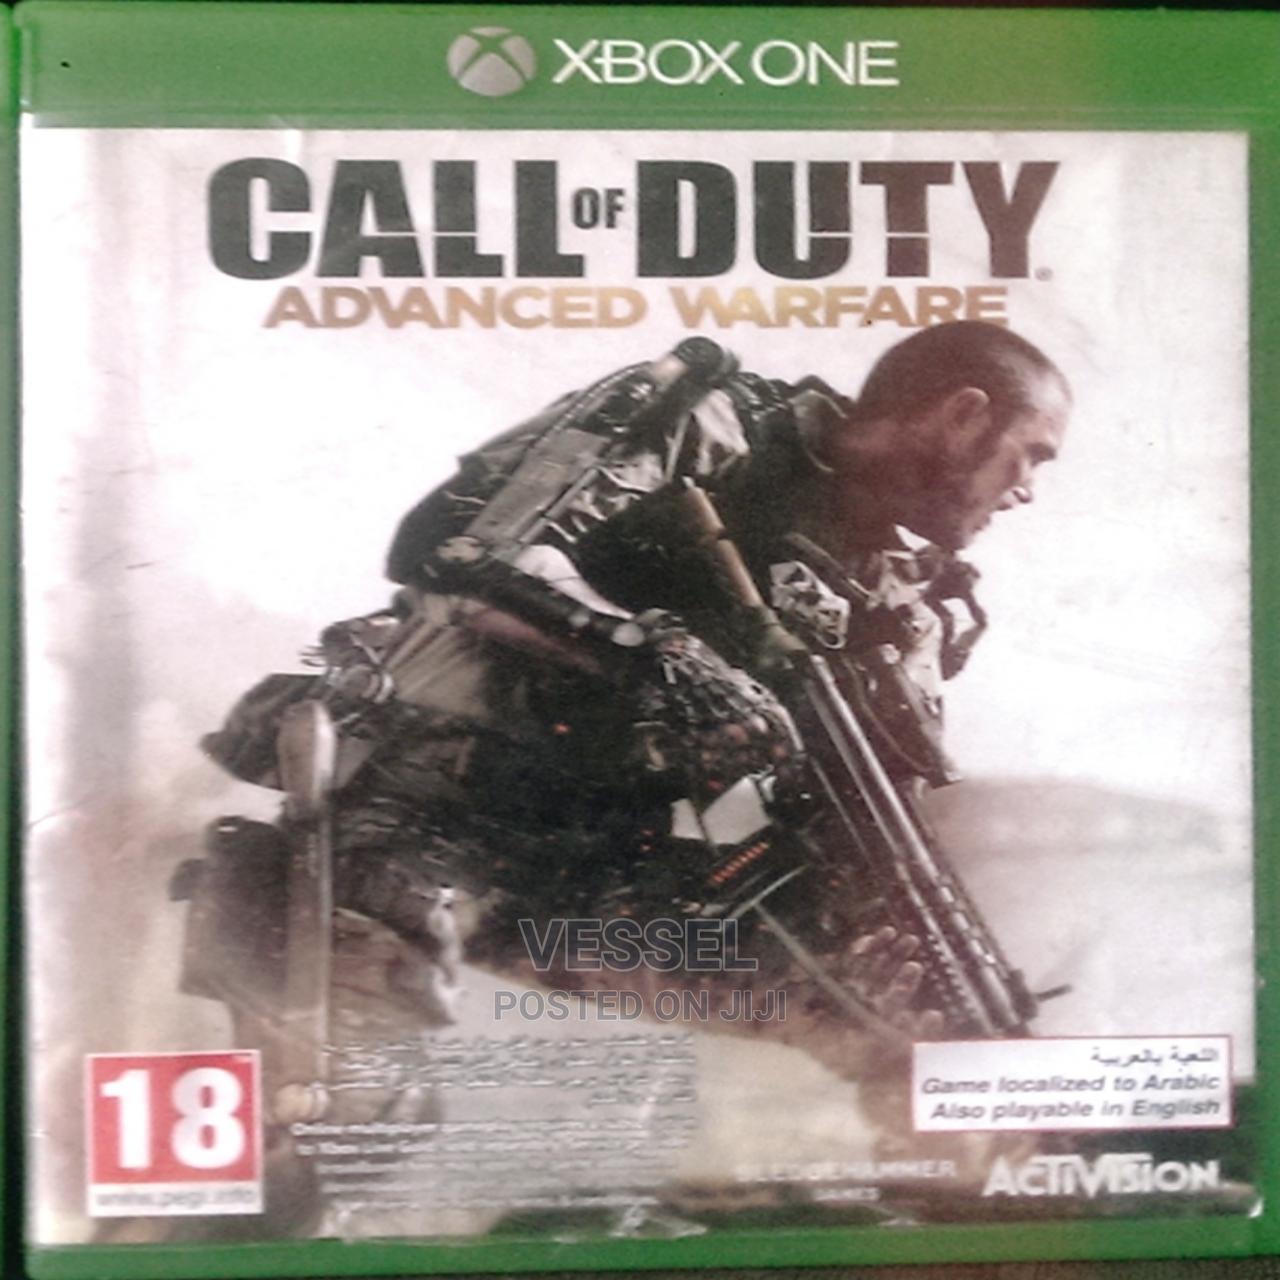 Archive: Xbox One Call of Duty Advanced Warfare